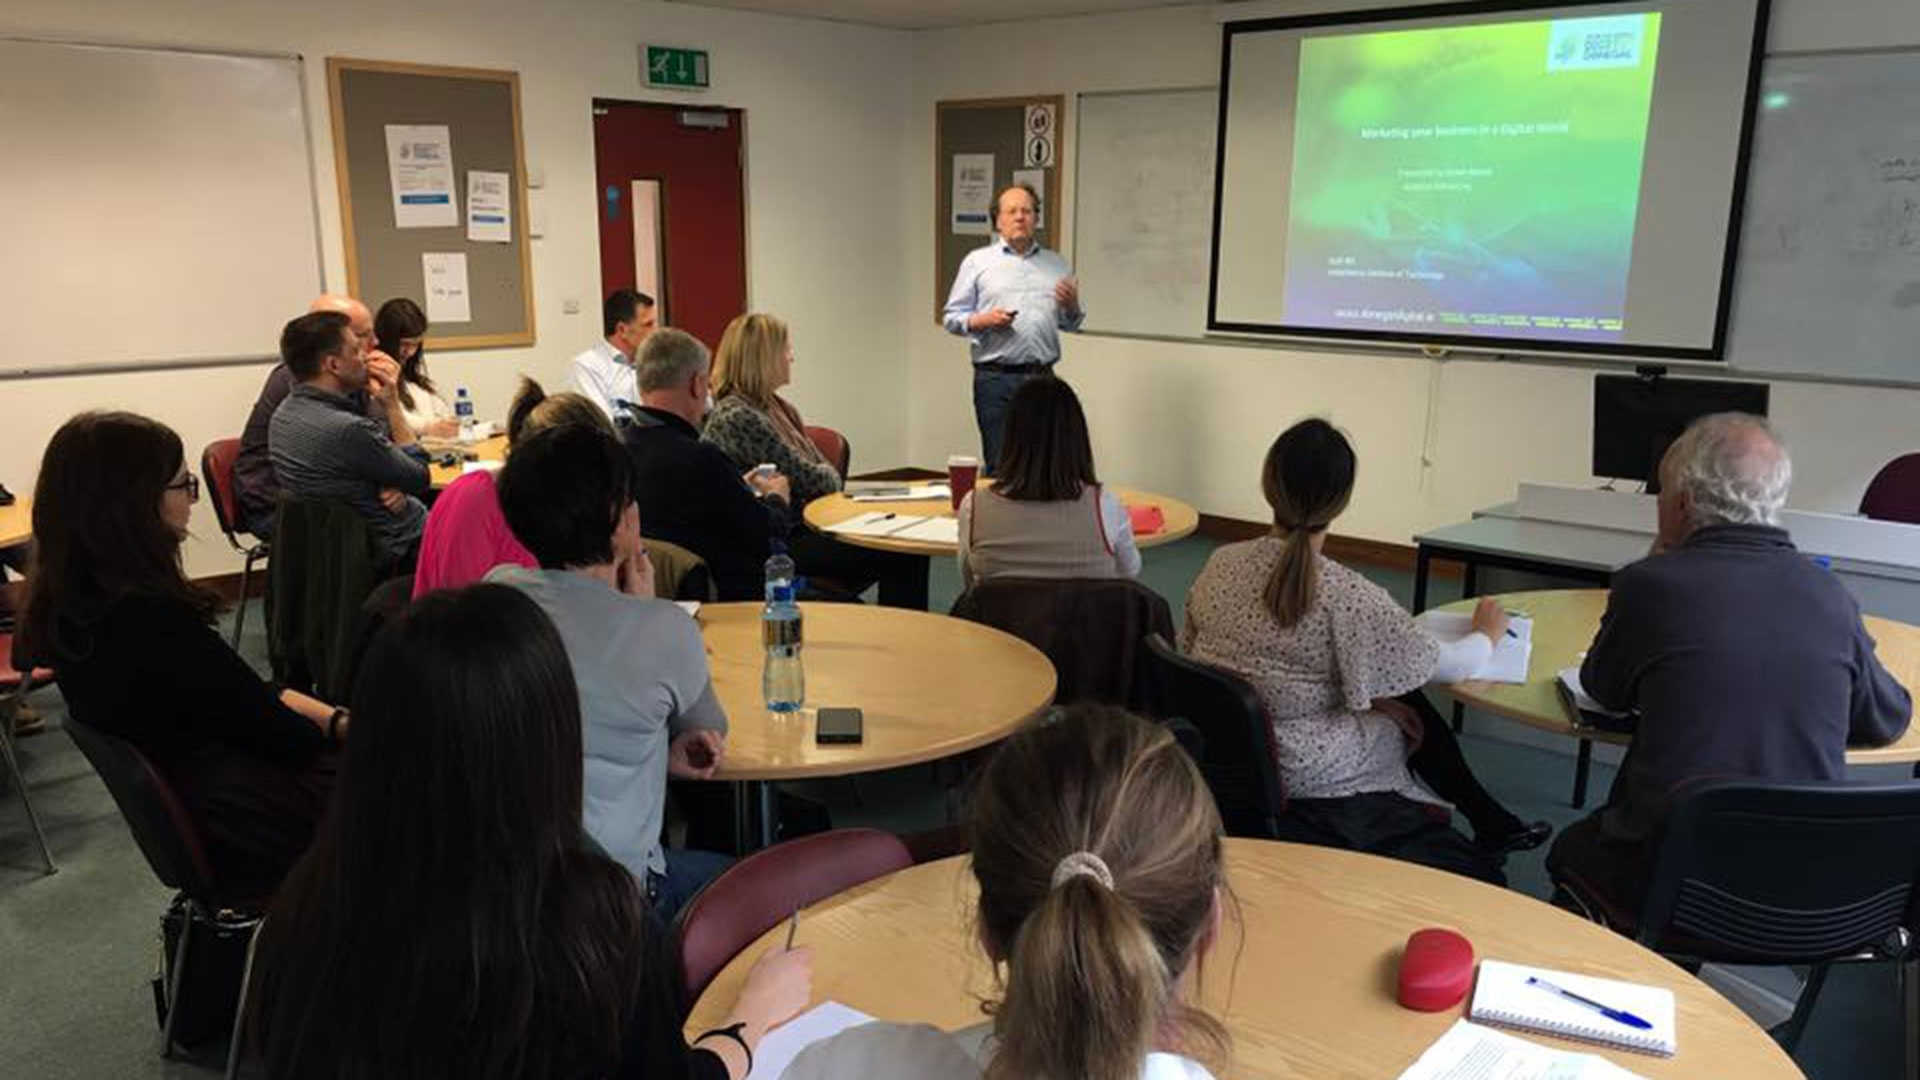 Marketing Your Business in a Digital World - Workshop 1